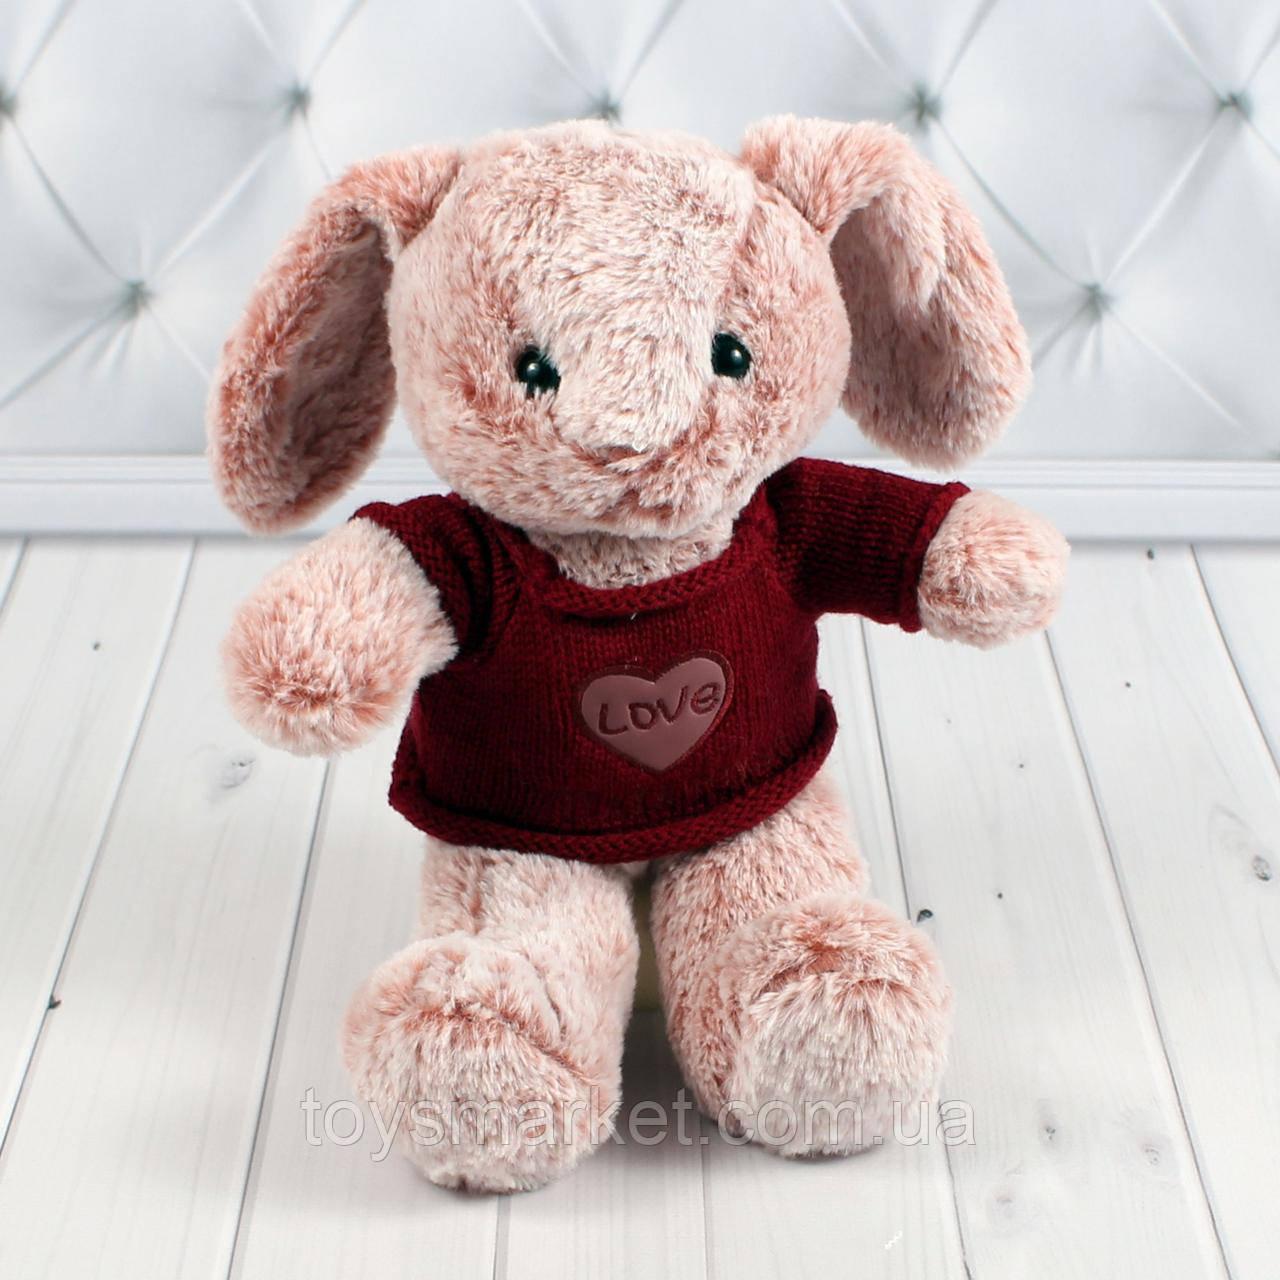 Мягкая игрушка Зайка, плюшевый заяц 20 см.